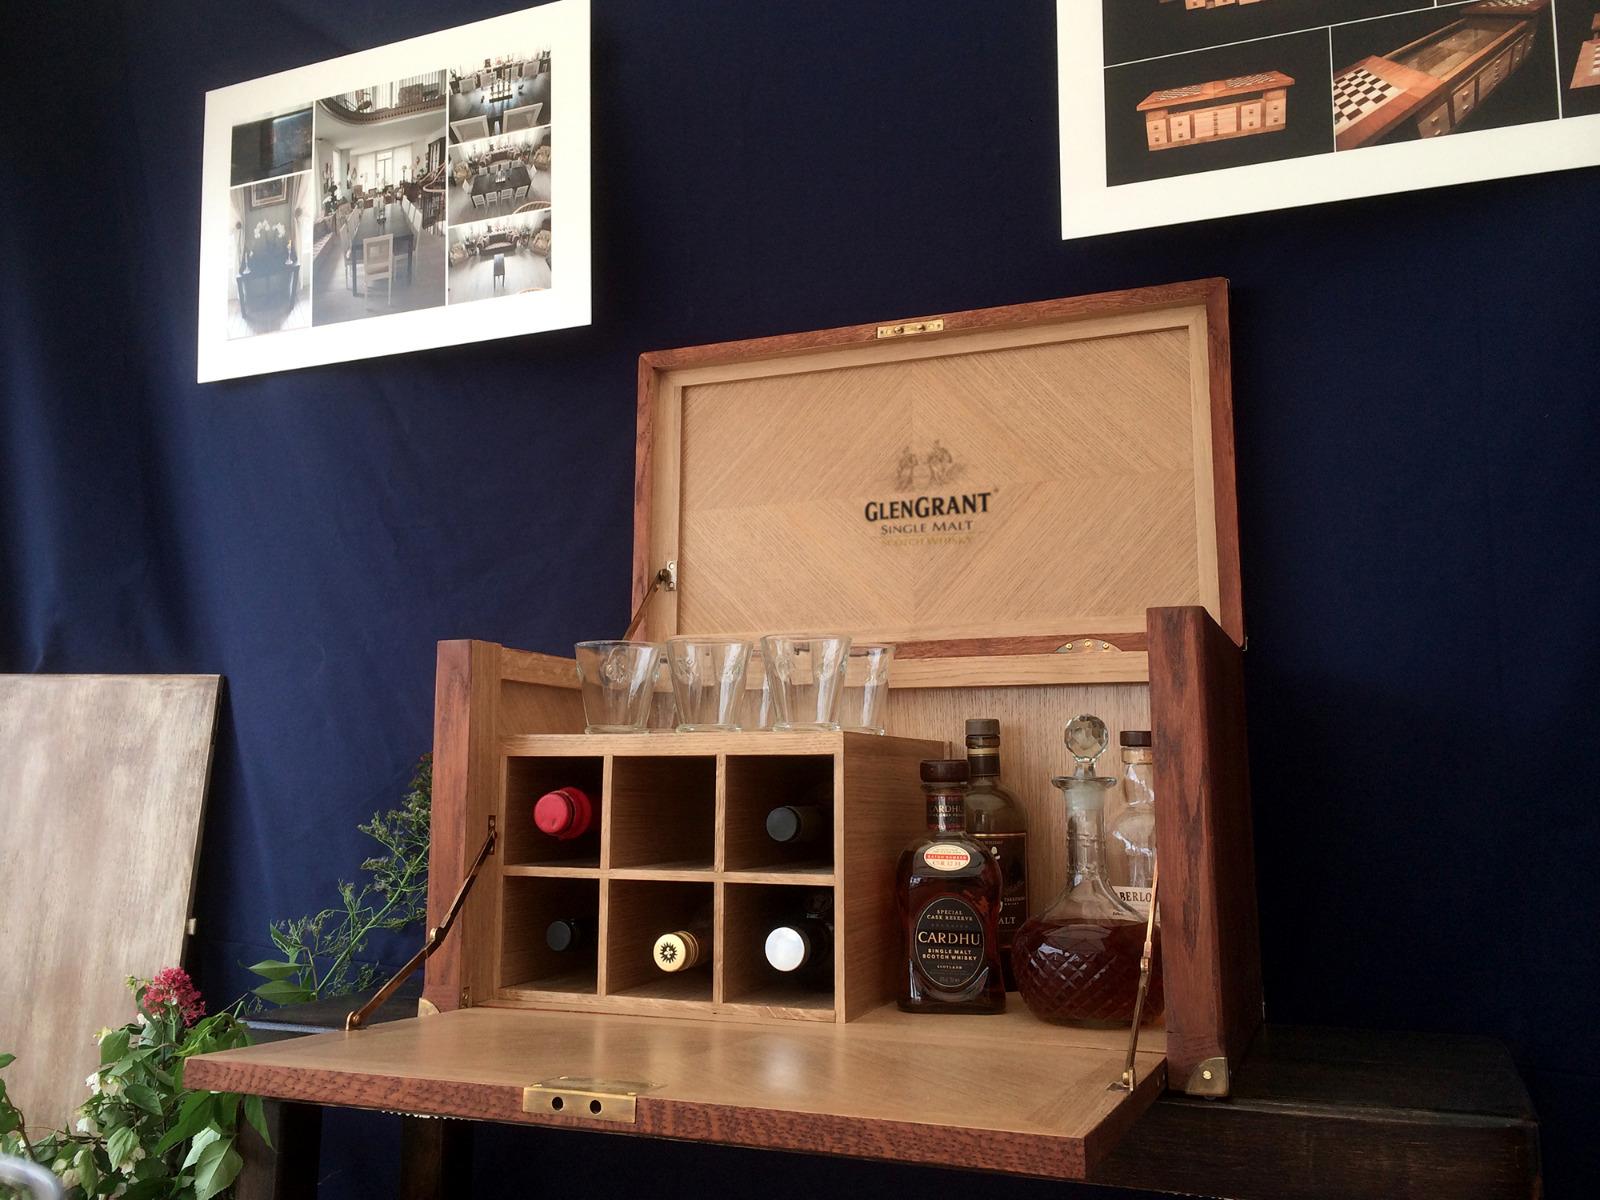 artisanart cave whisky r alis e par l 39 atelier bdm. Black Bedroom Furniture Sets. Home Design Ideas